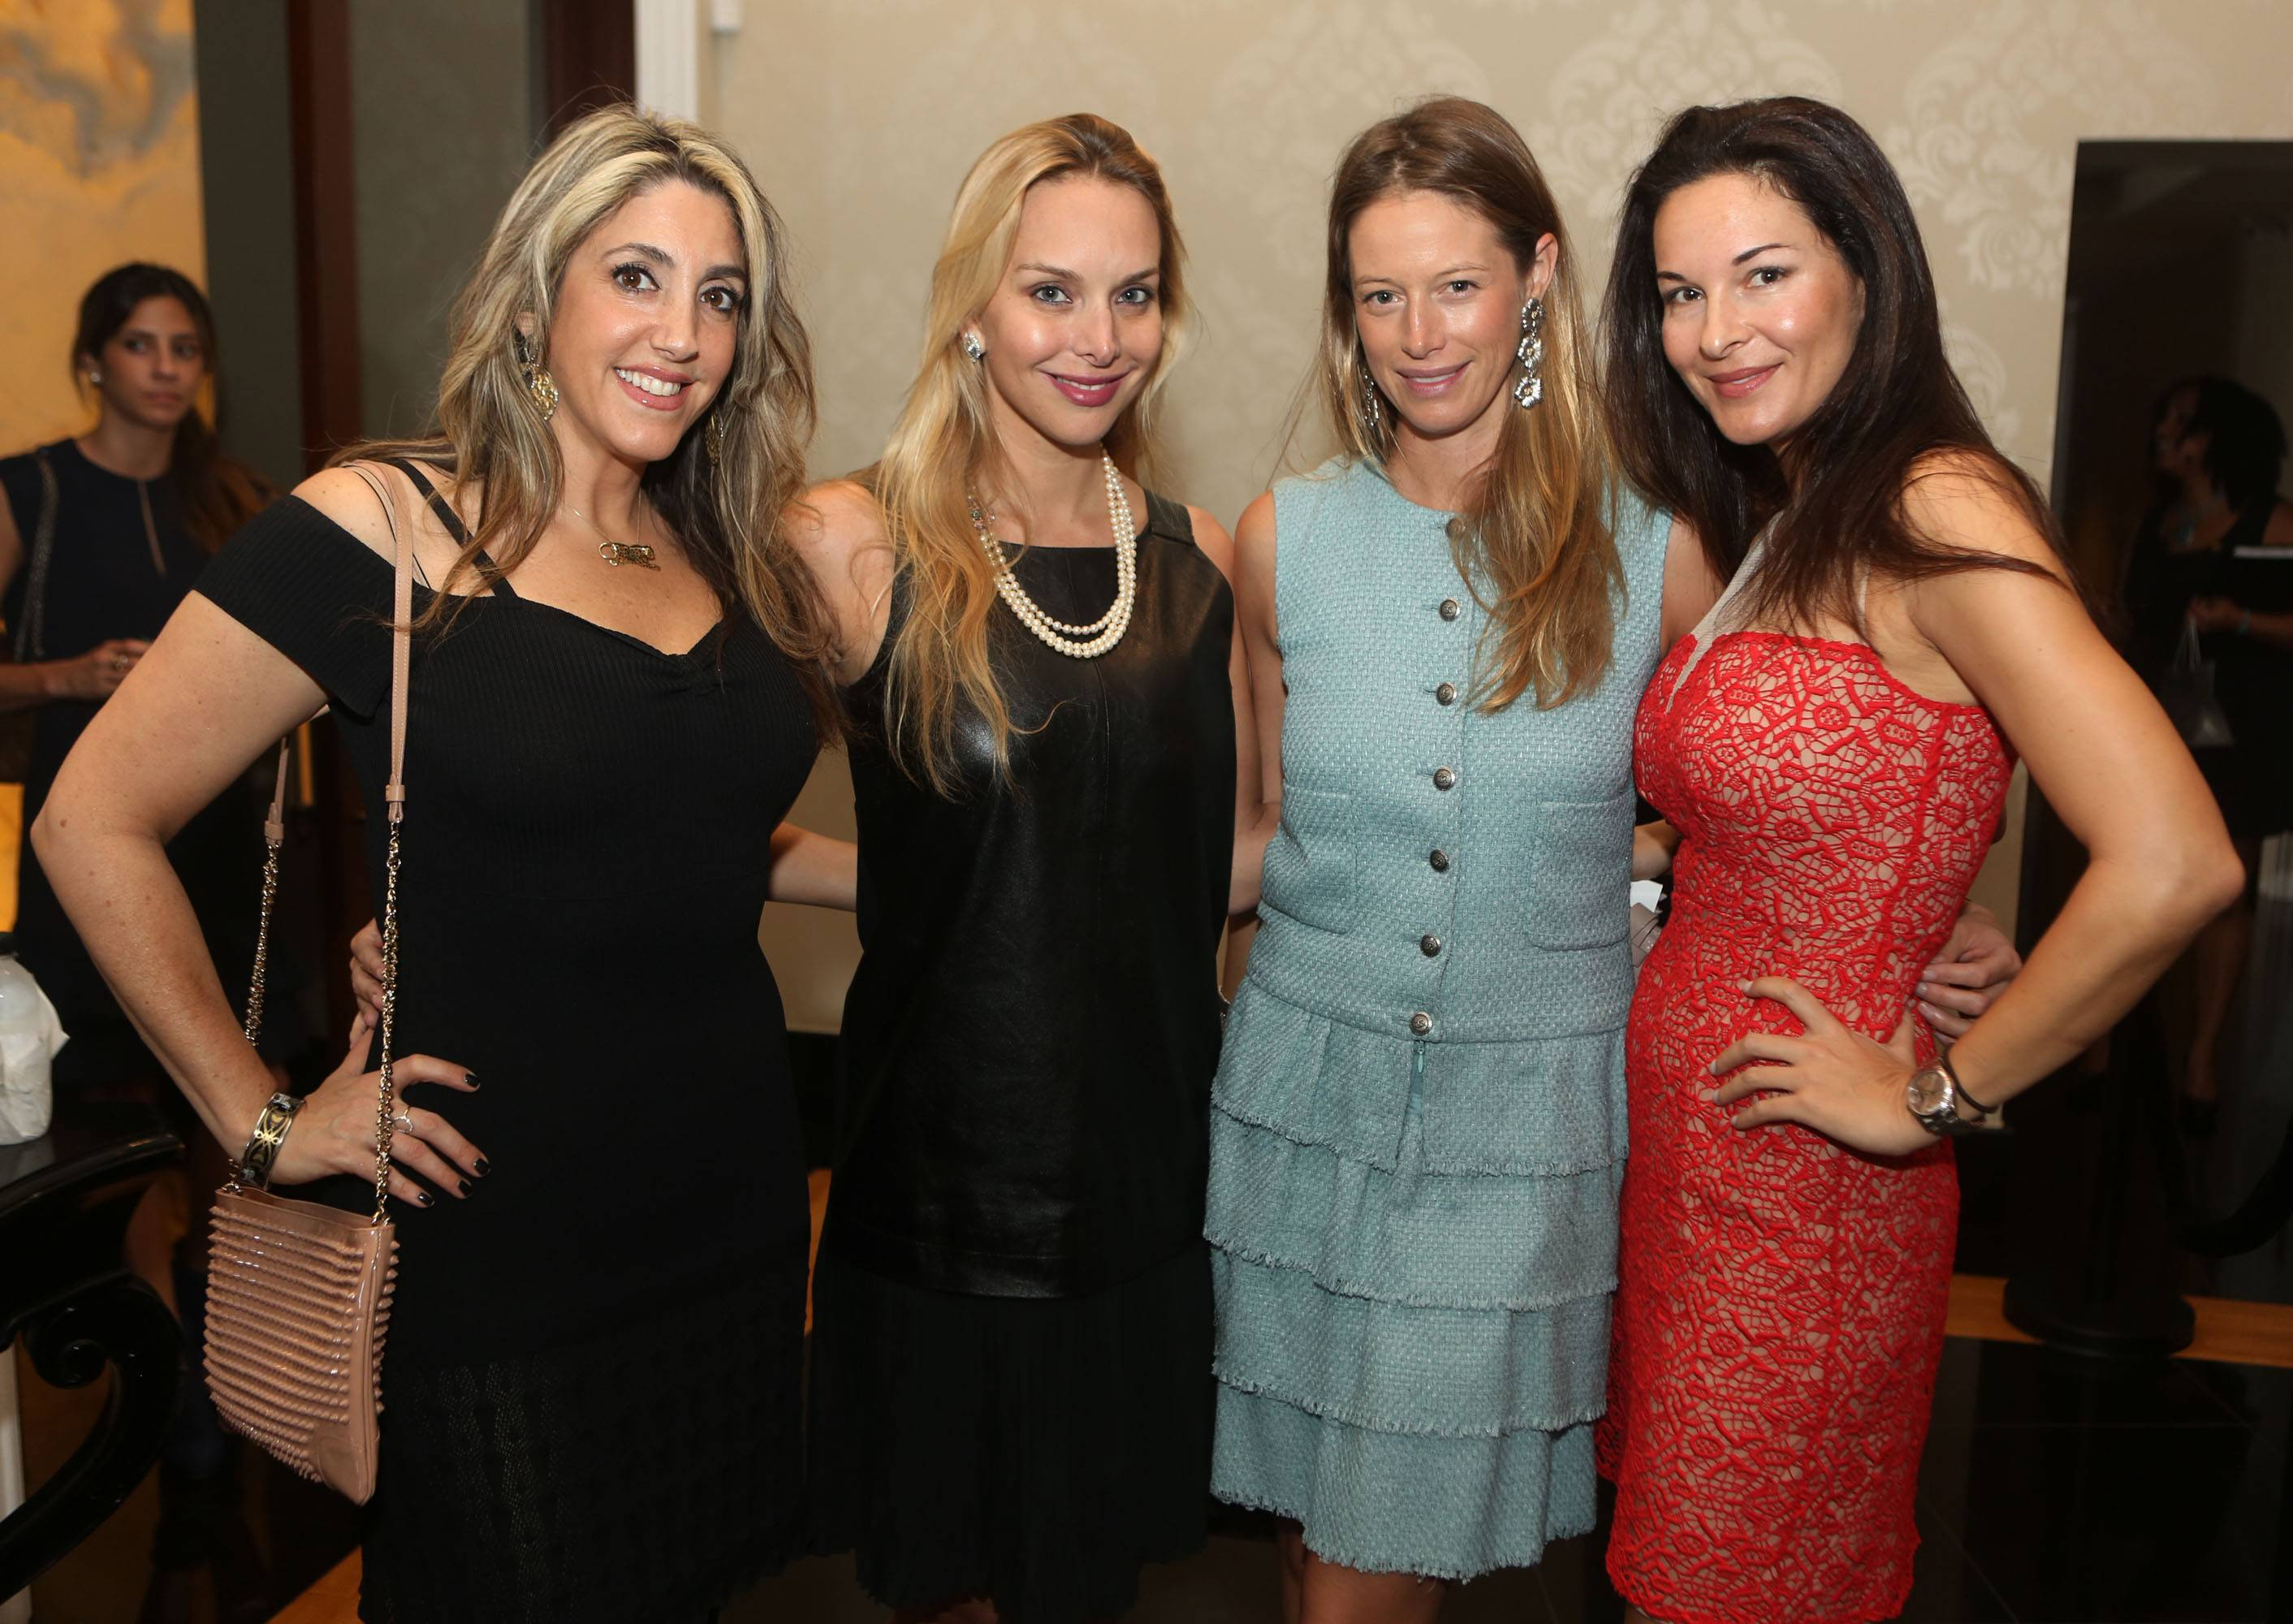 Jillian Jacobson, Christina Getty, Sara Colombo, & Nathasha Dubarry